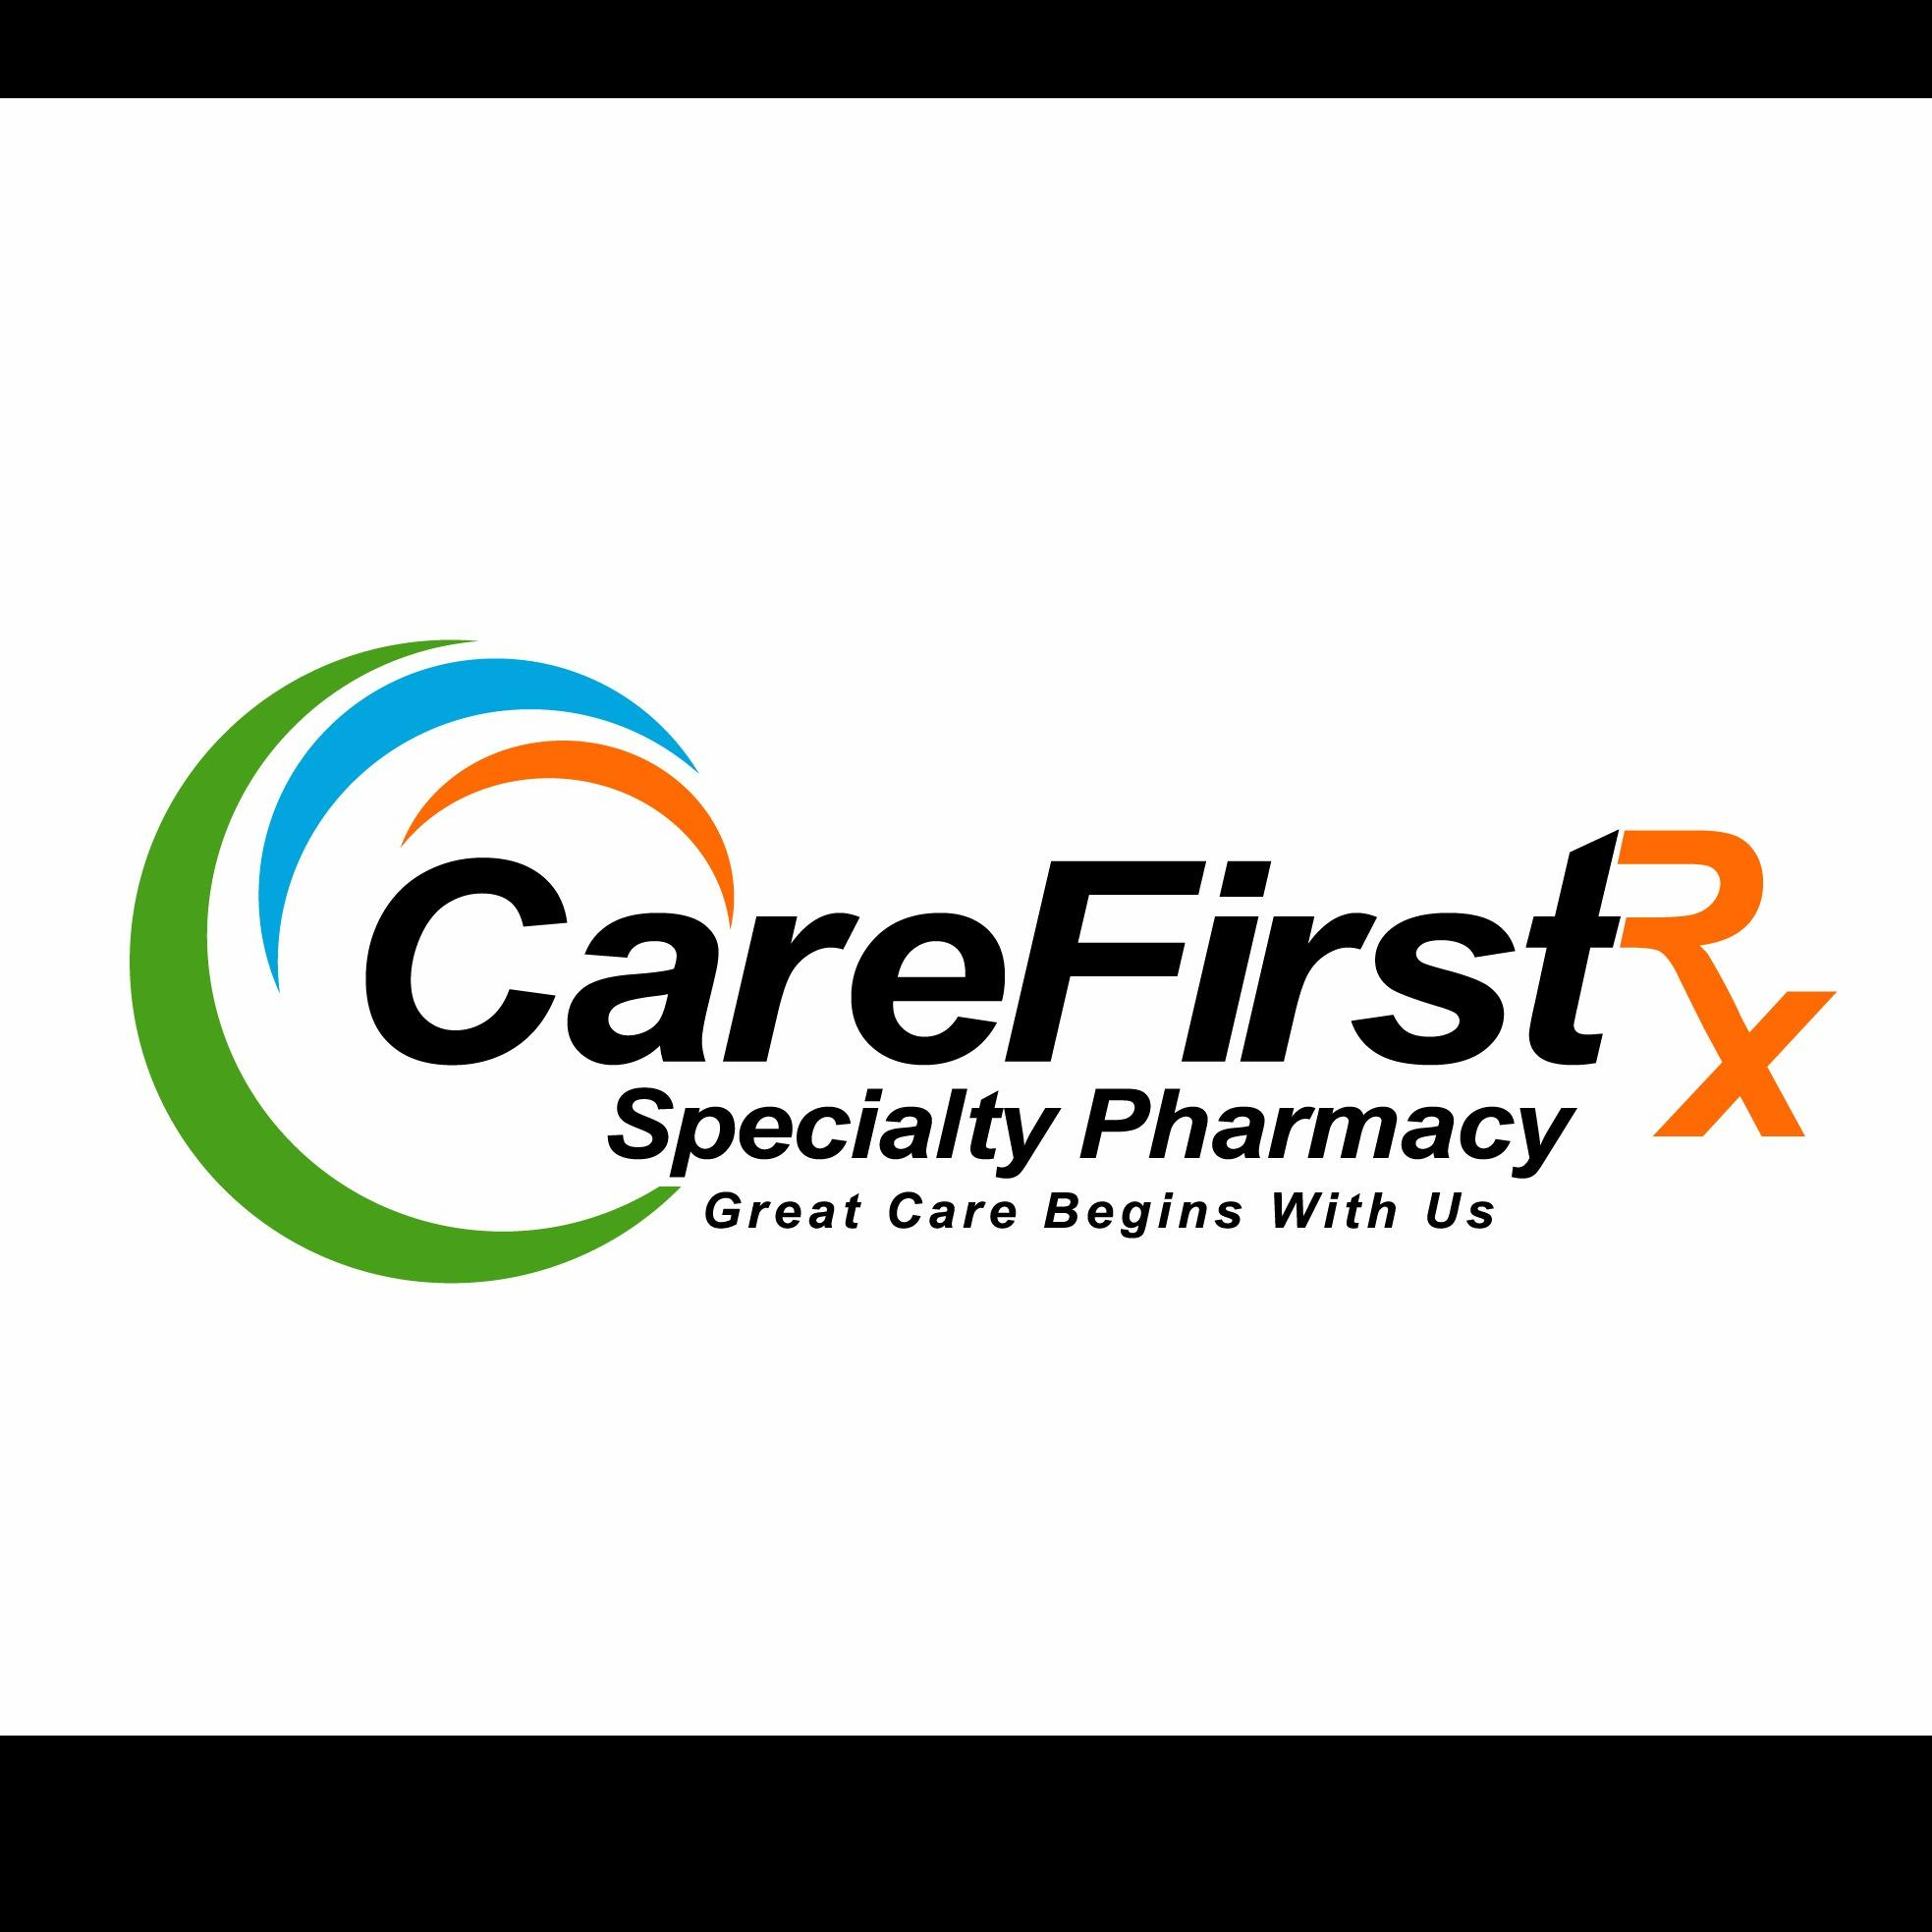 CareFirst Specialty Pharmacy